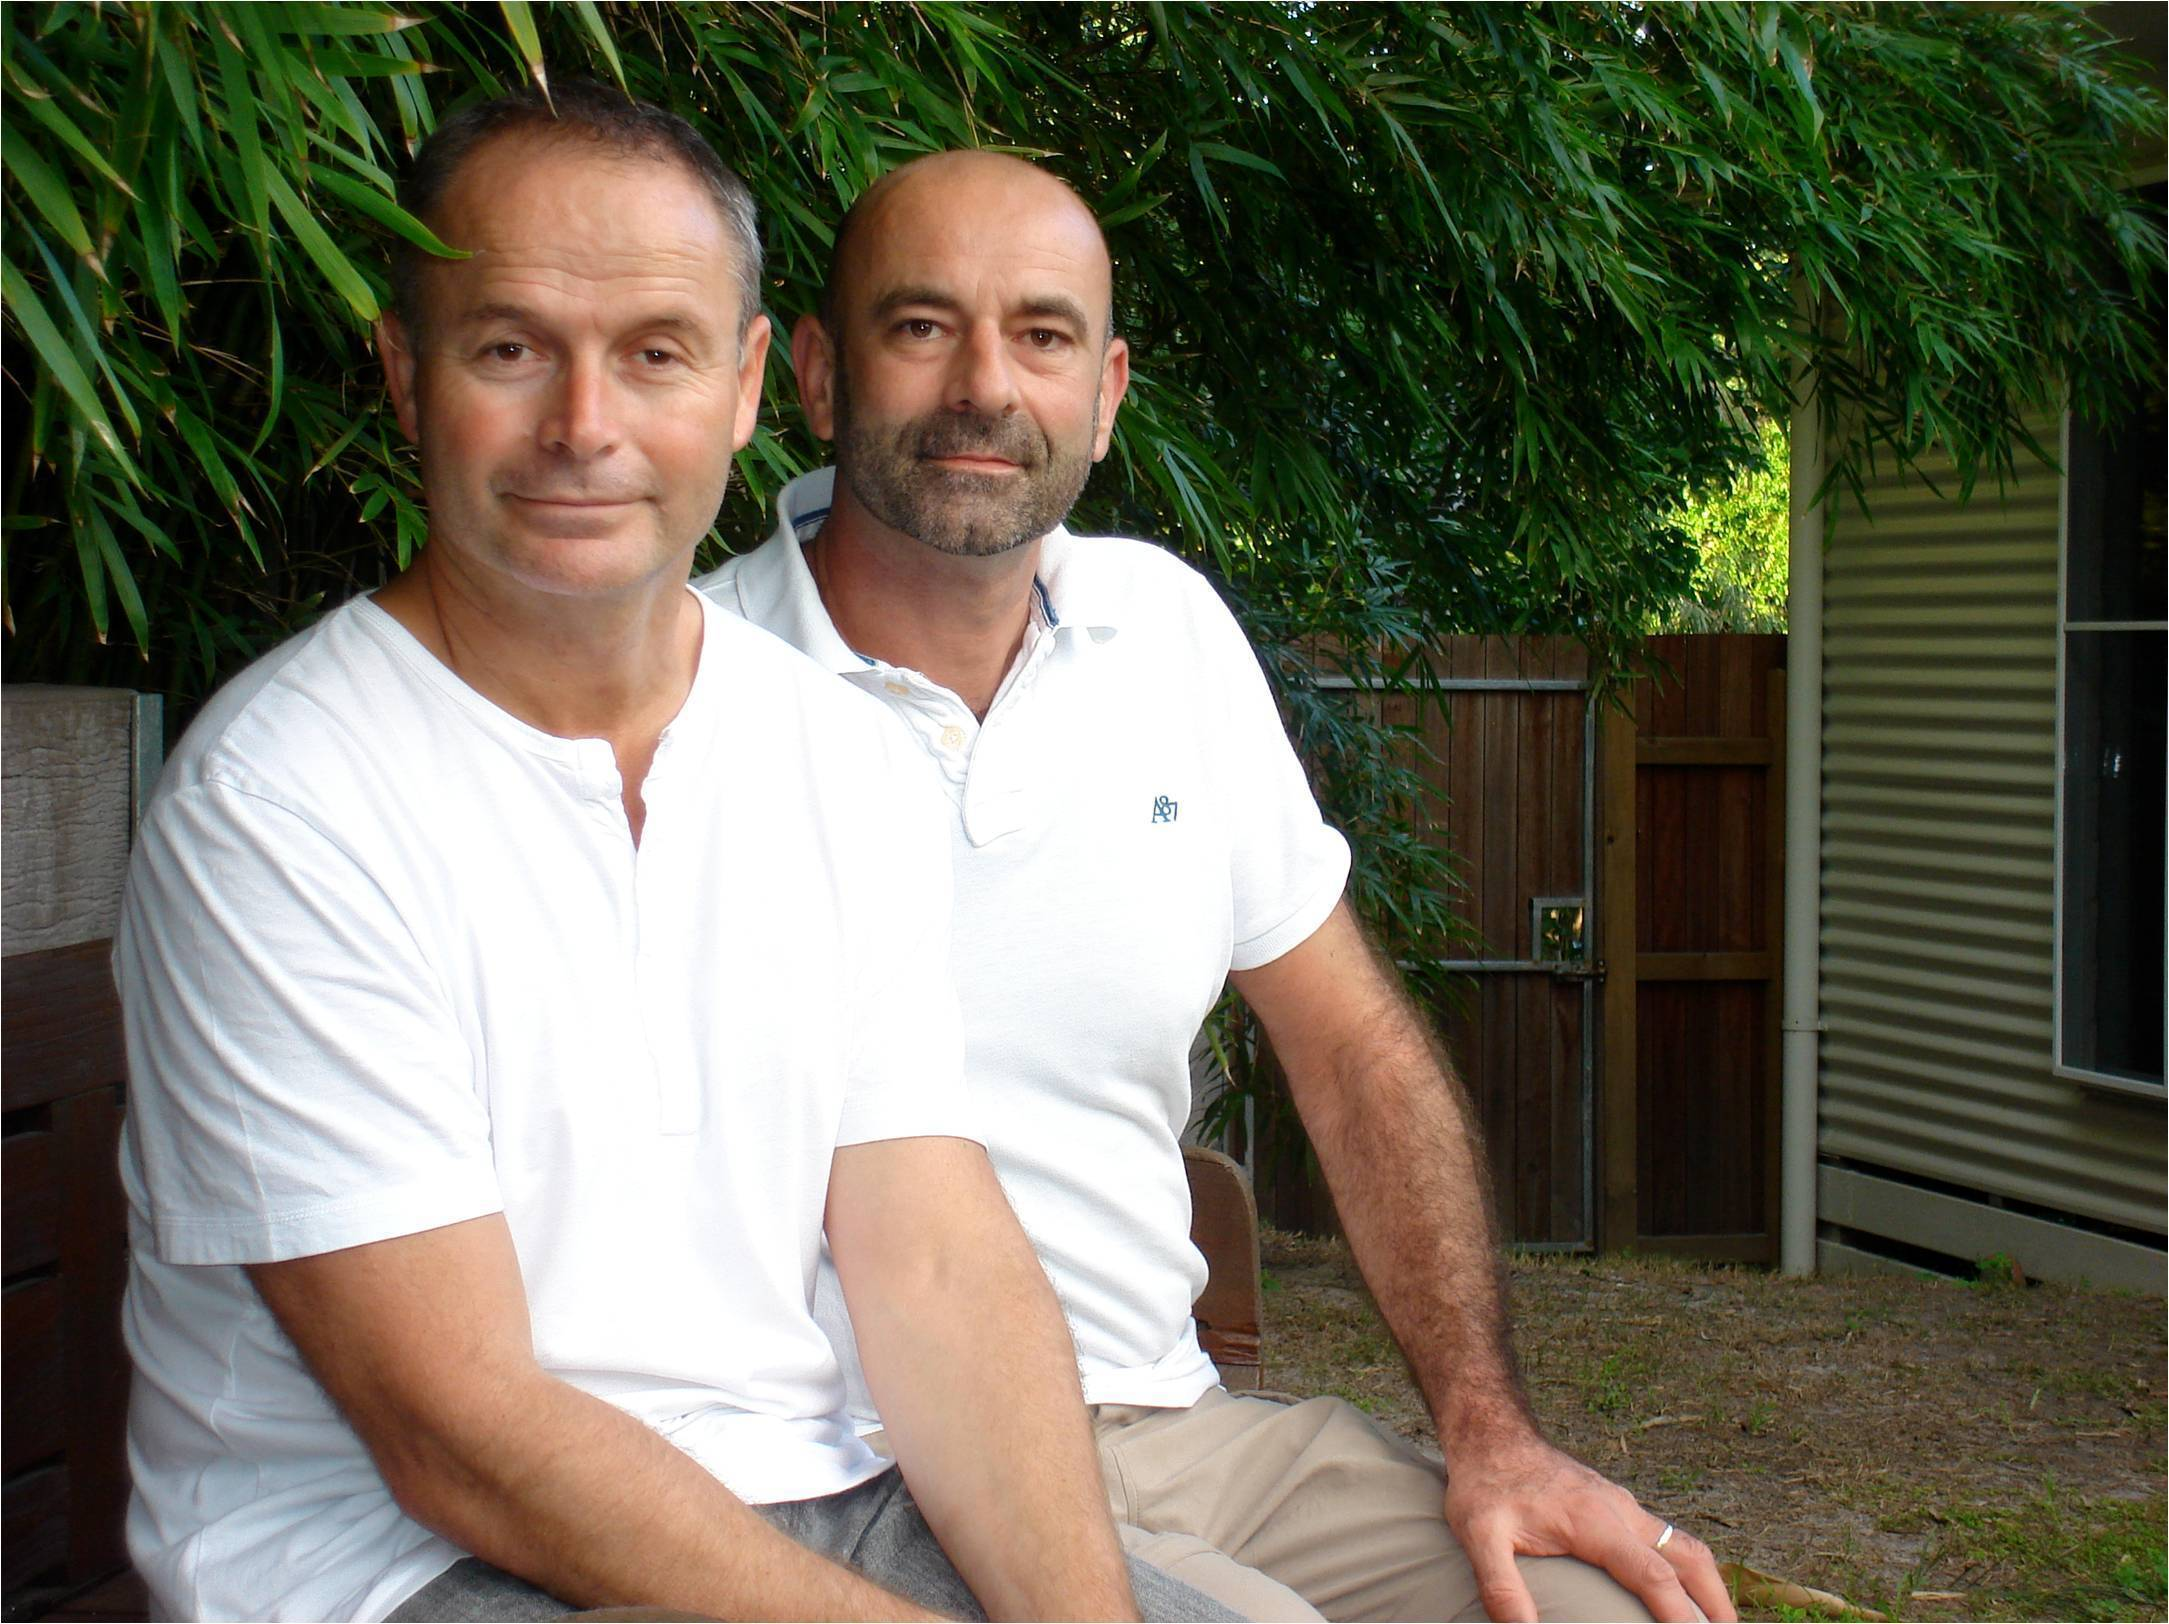 Andrew and Matt - Successful Seachangers